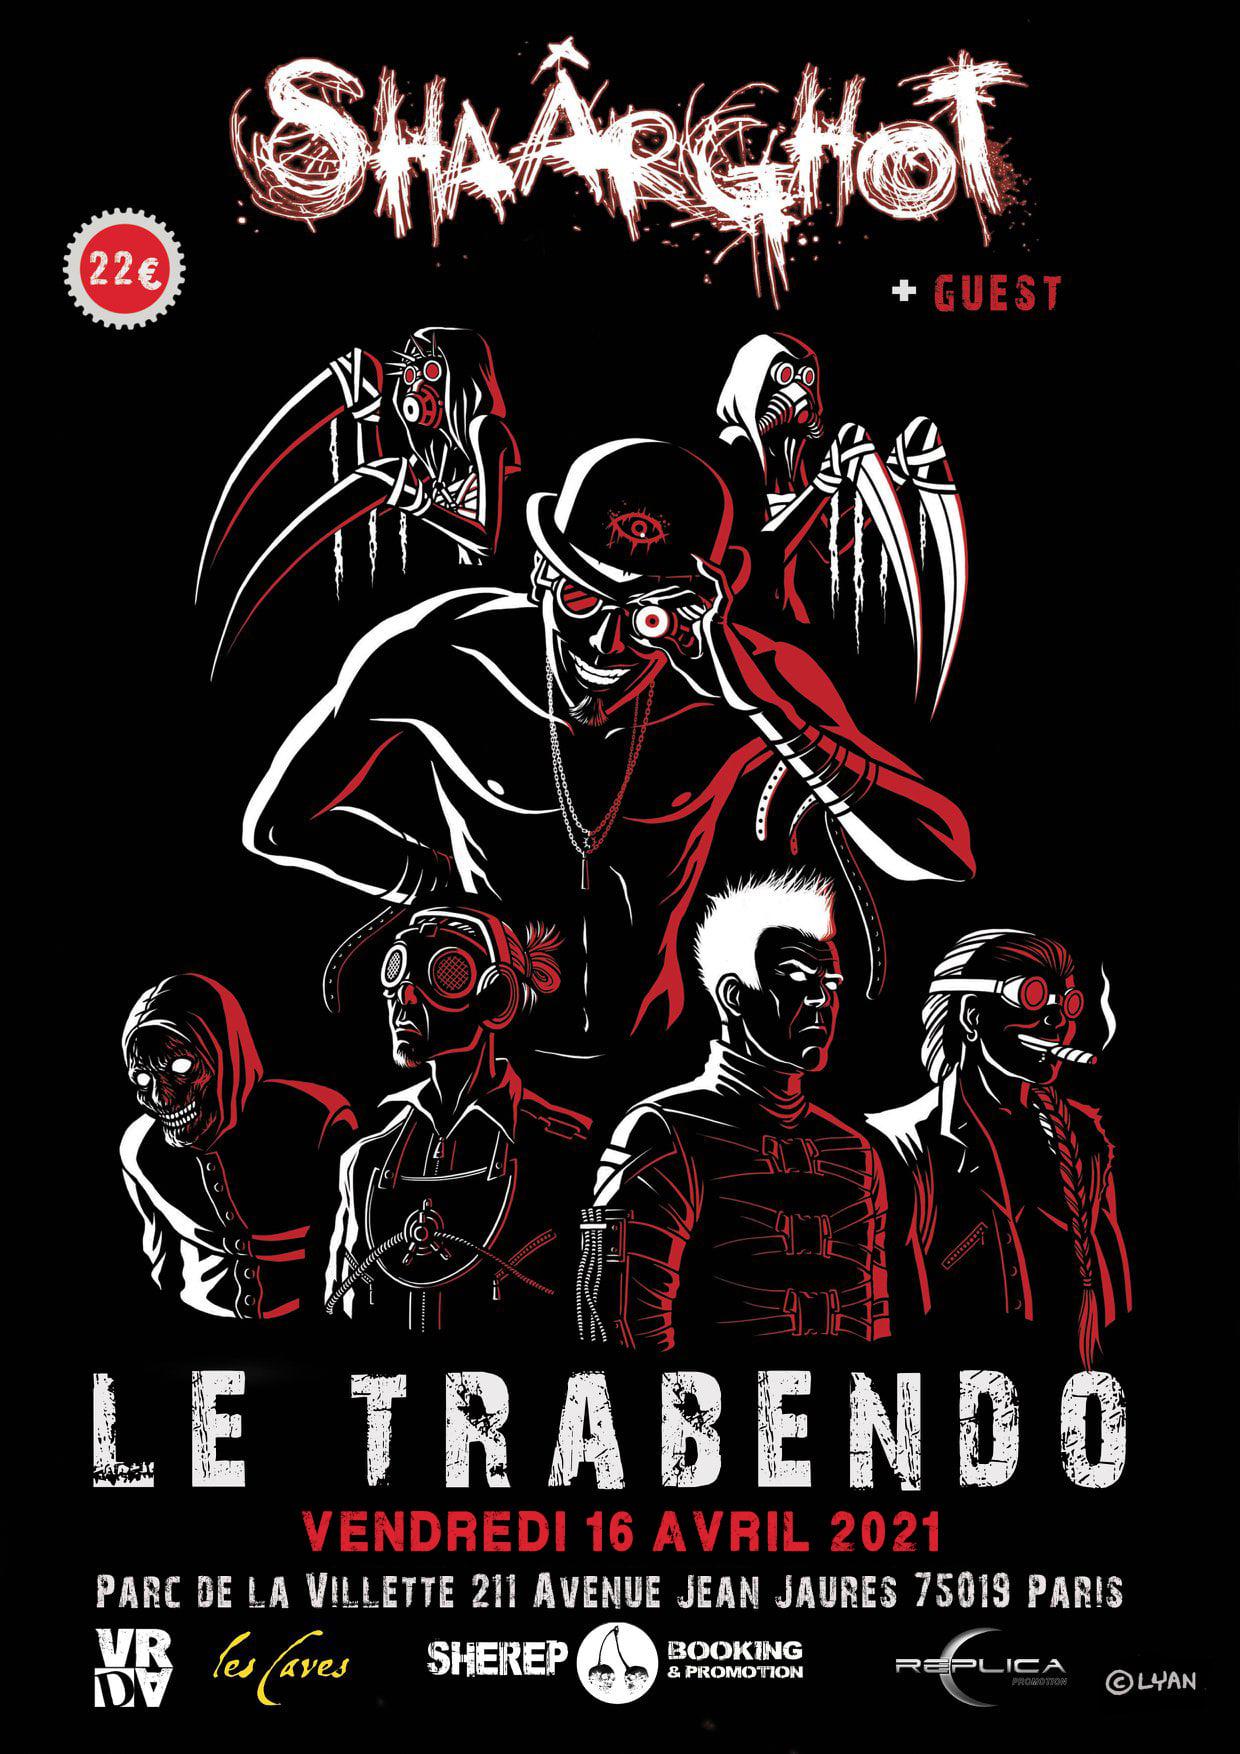 Shaârghot @ Le Trabendo (Paris) - 16 avril 2021